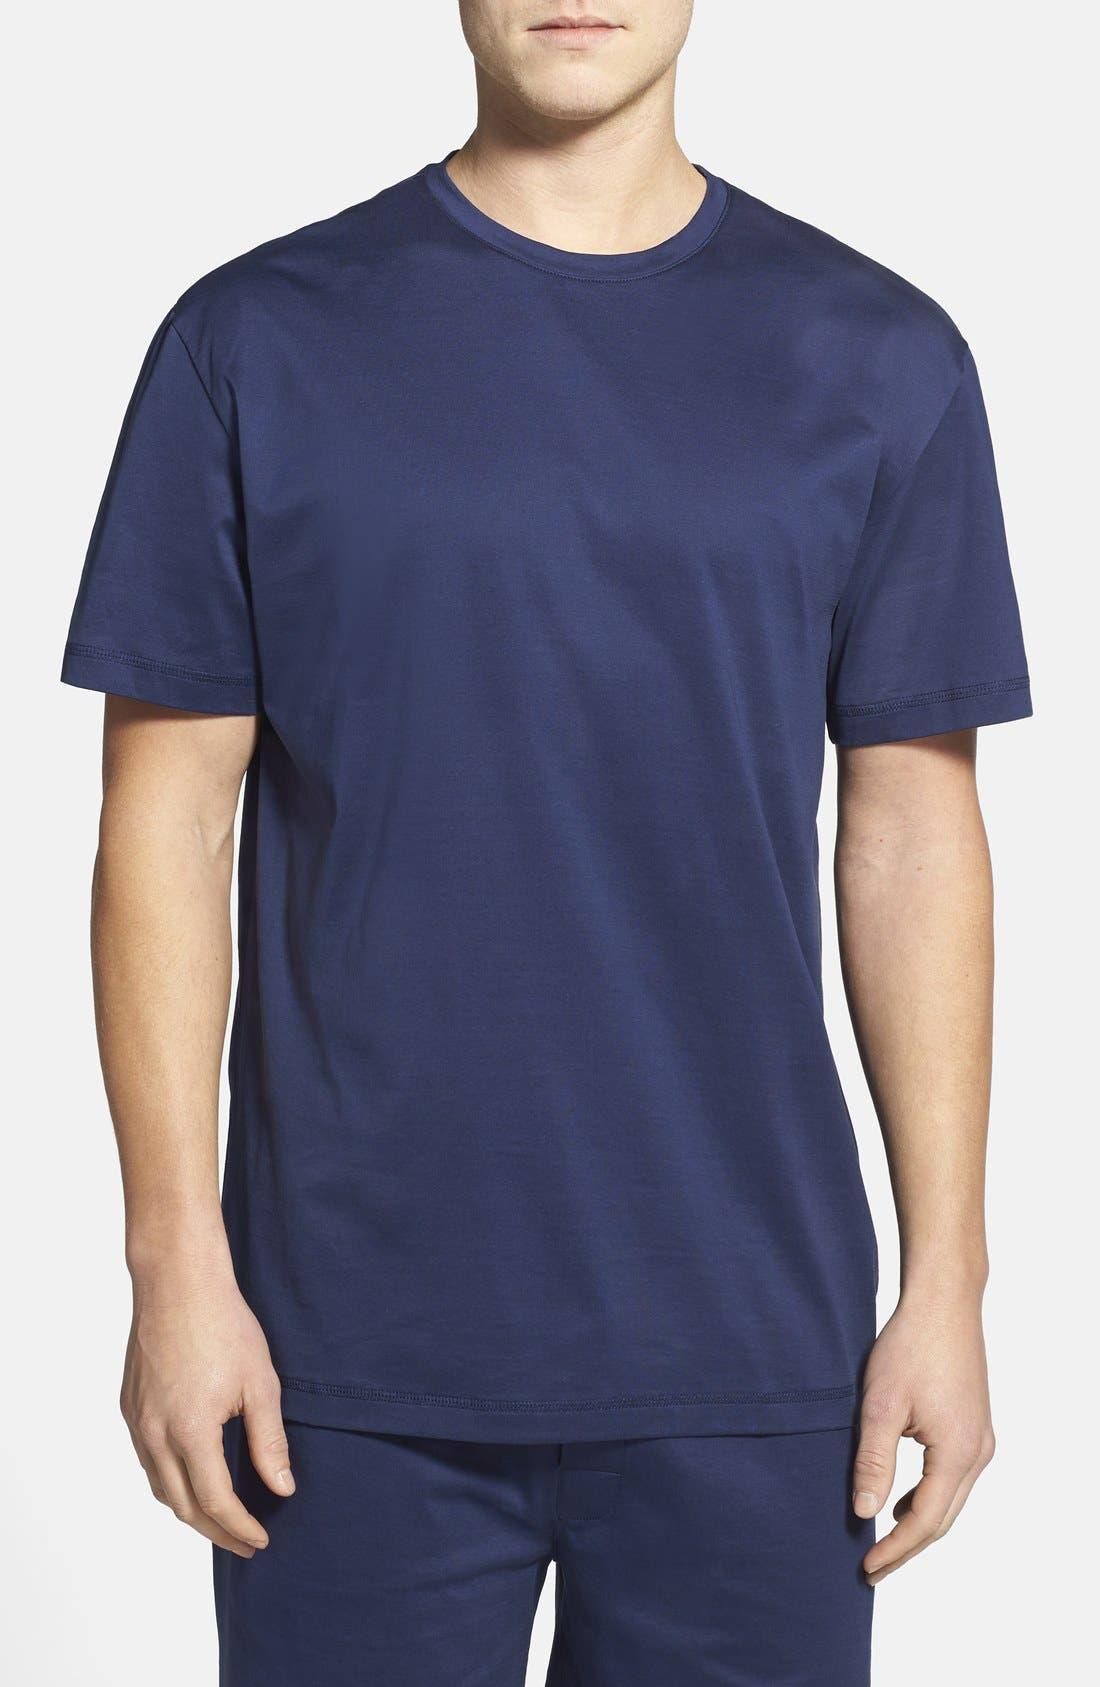 Majestic International 'Down Time' Crewneck T-Shirt